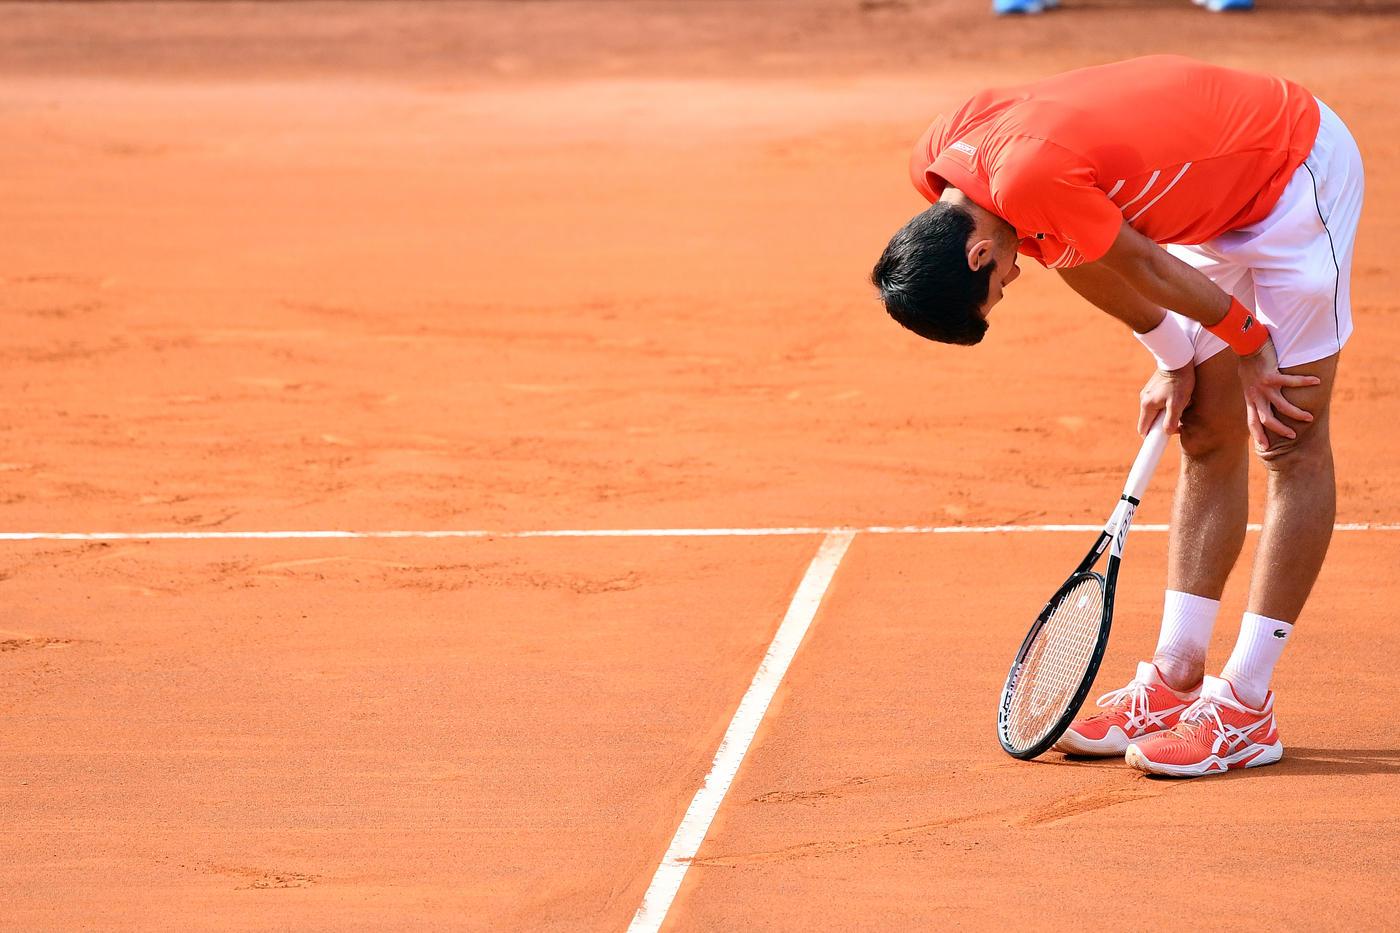 Internazionali d'Italia: Nadal trionfa a Roma